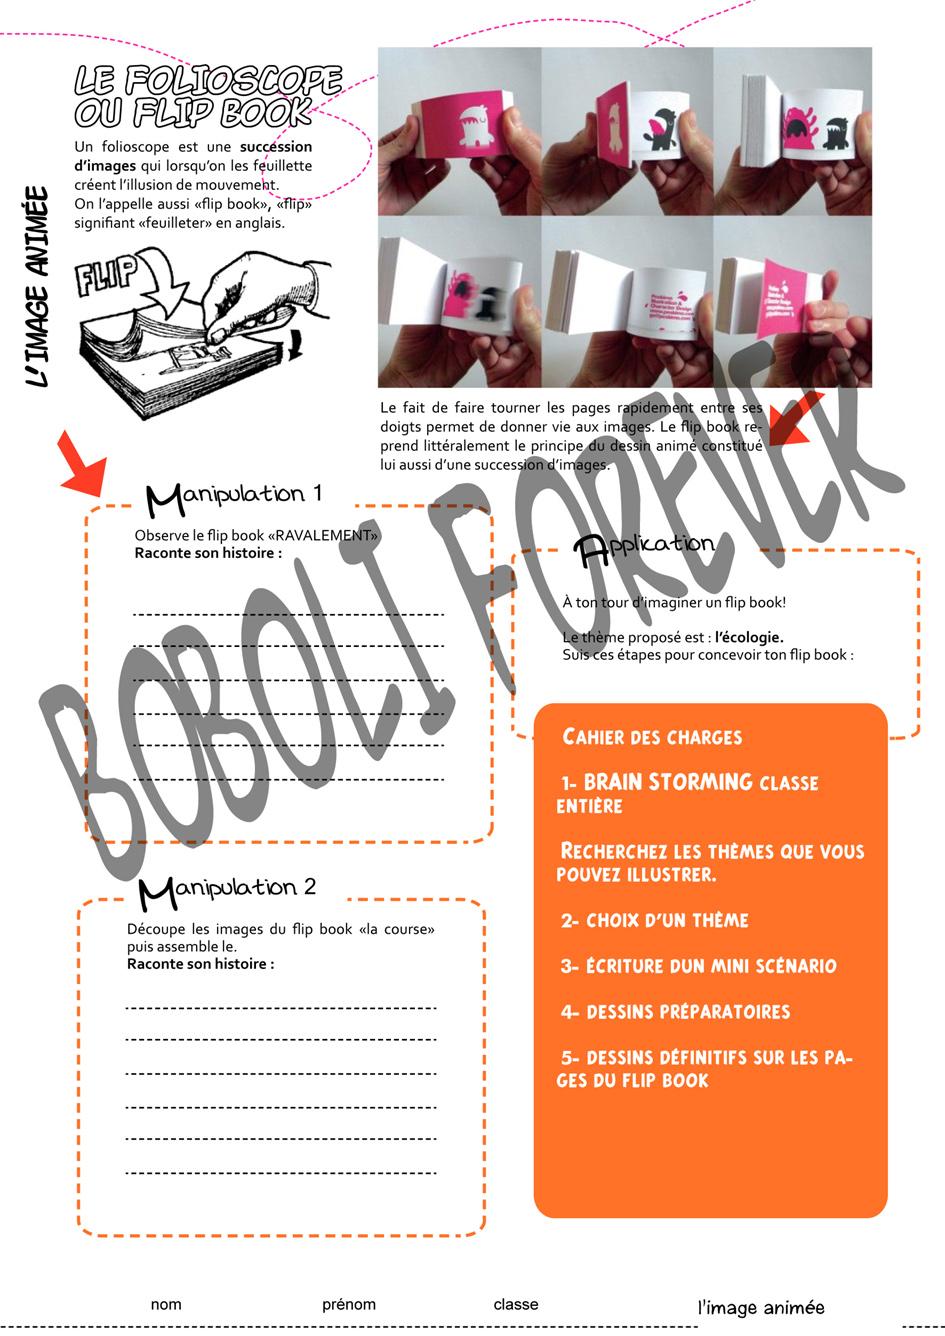 Bien connu La narration par l'image (phase 2 l'image animée) | Boboli Forever 2 JM22